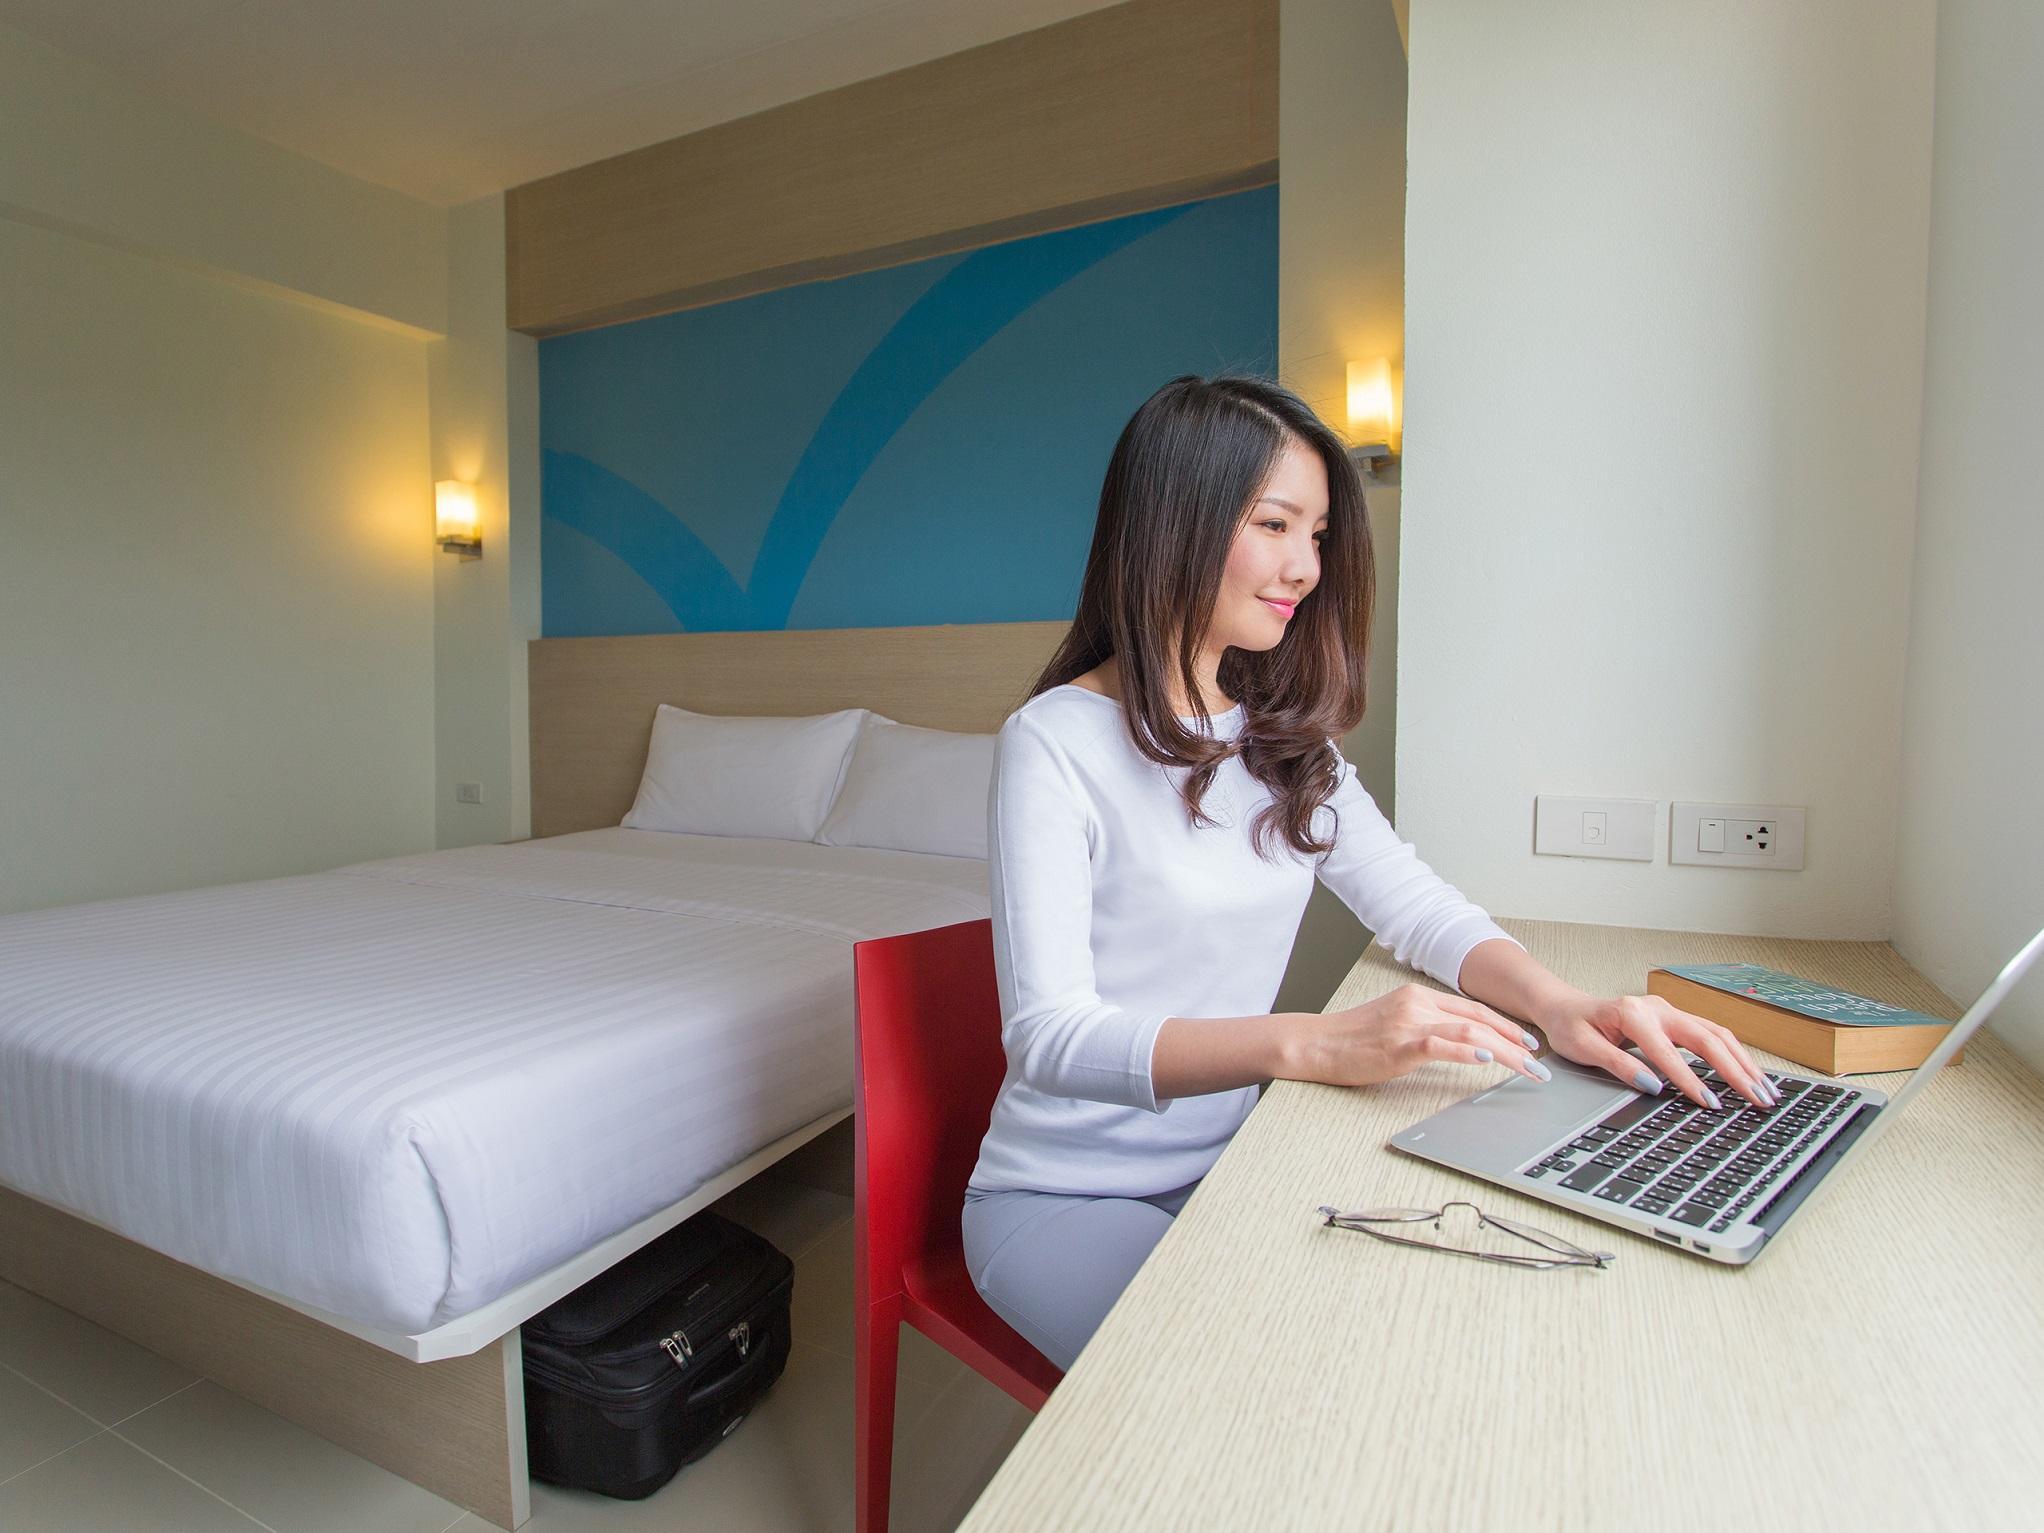 8. DoubleRoom at Hop Inn Hotel